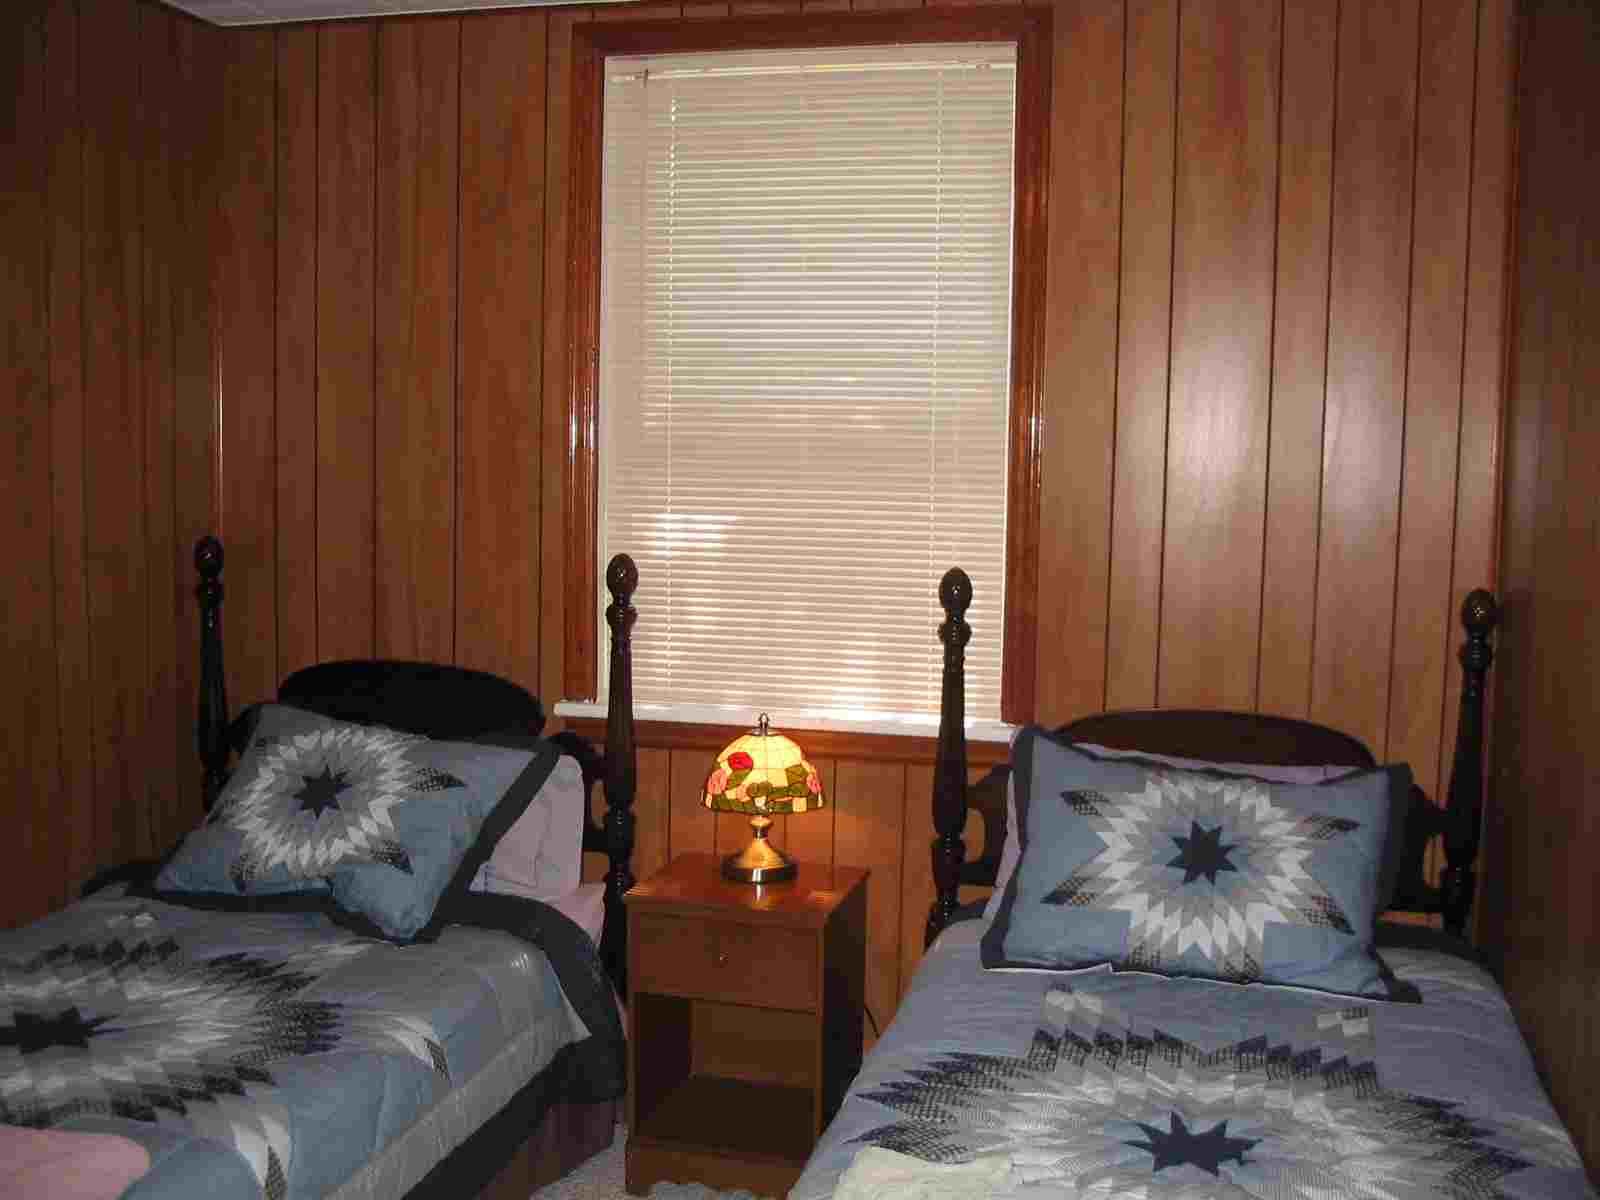 CottageRentalOntario4Bedroom.jpg